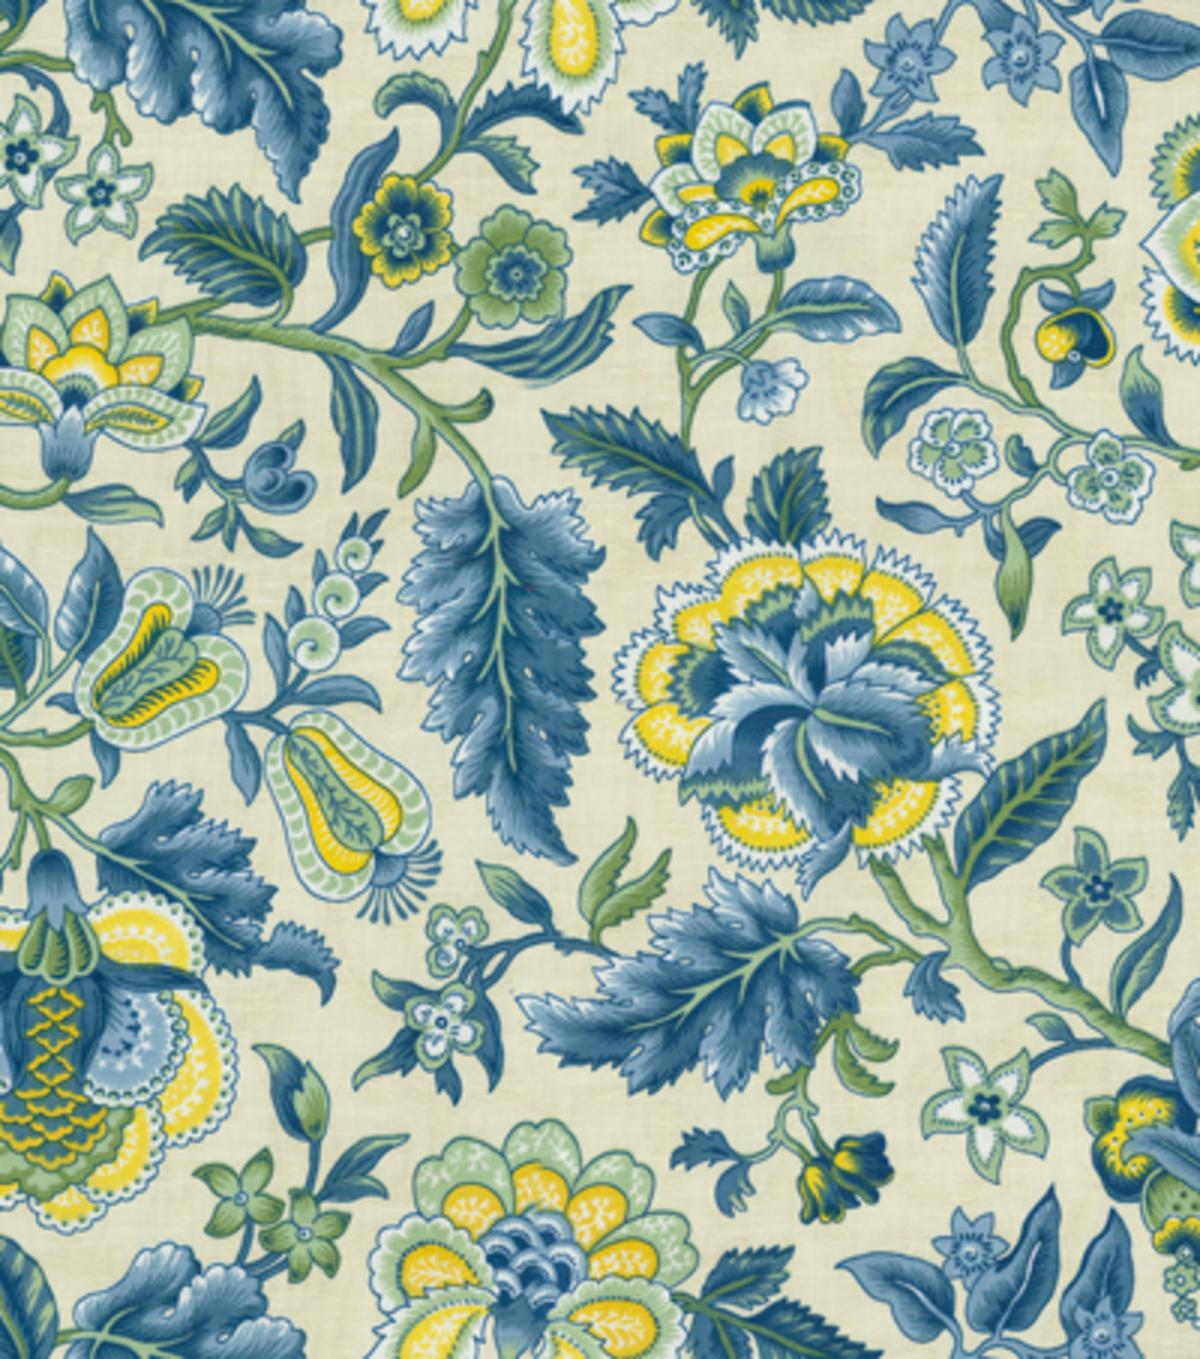 Home Decor Print Fabric Waverly Imperial Dress Porcelain Joann